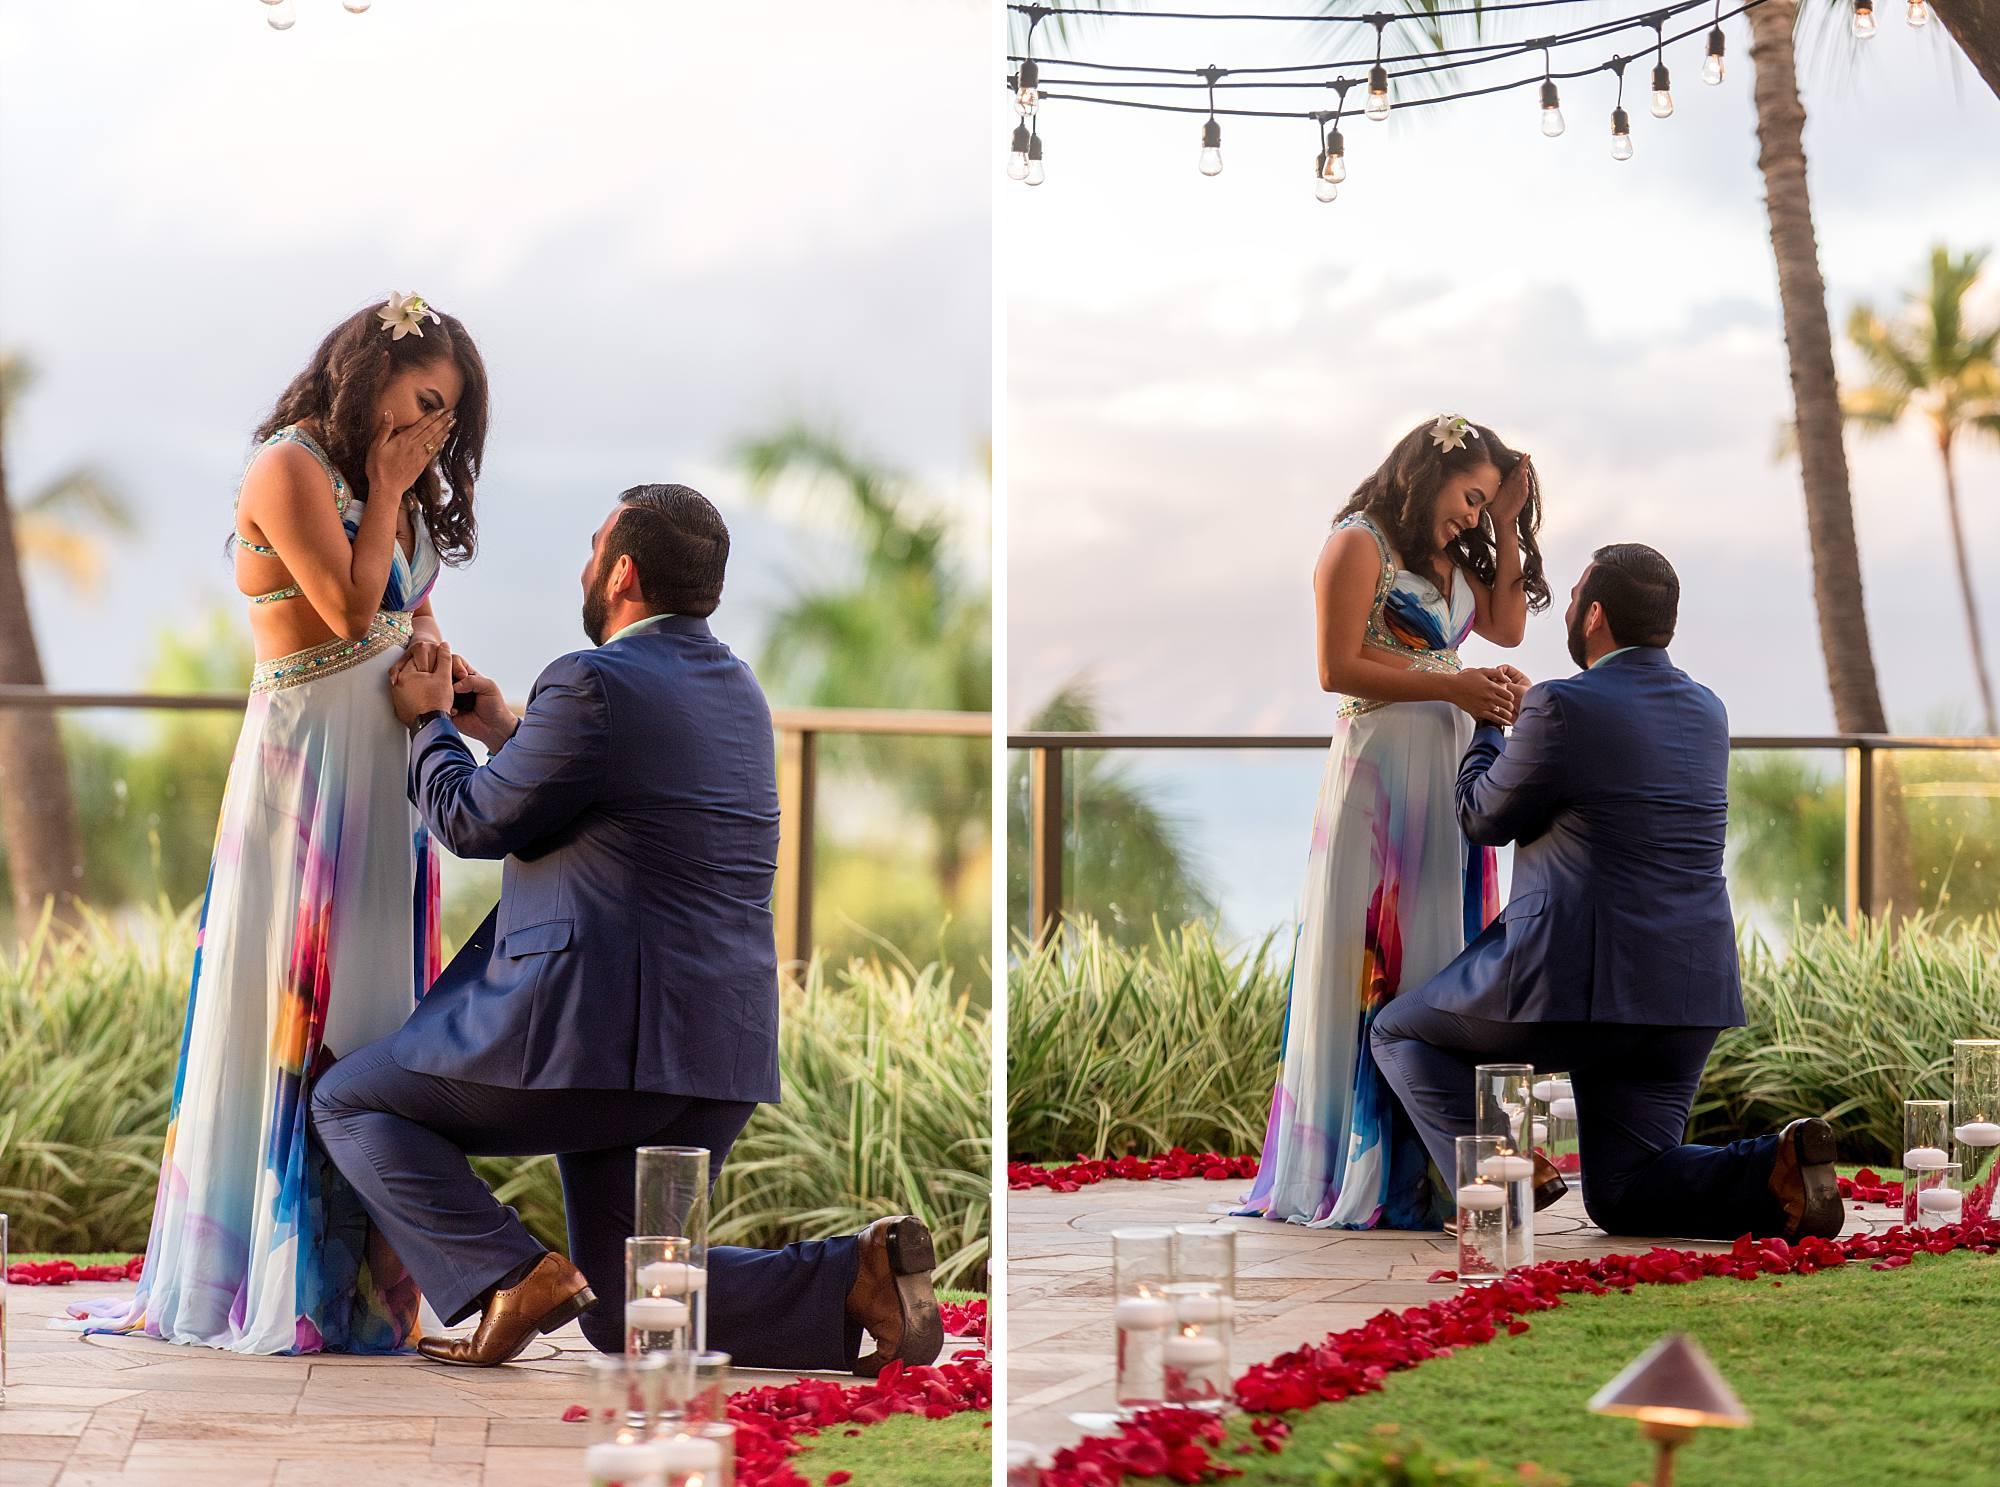 Man proposing, down on one knee, woman suprised